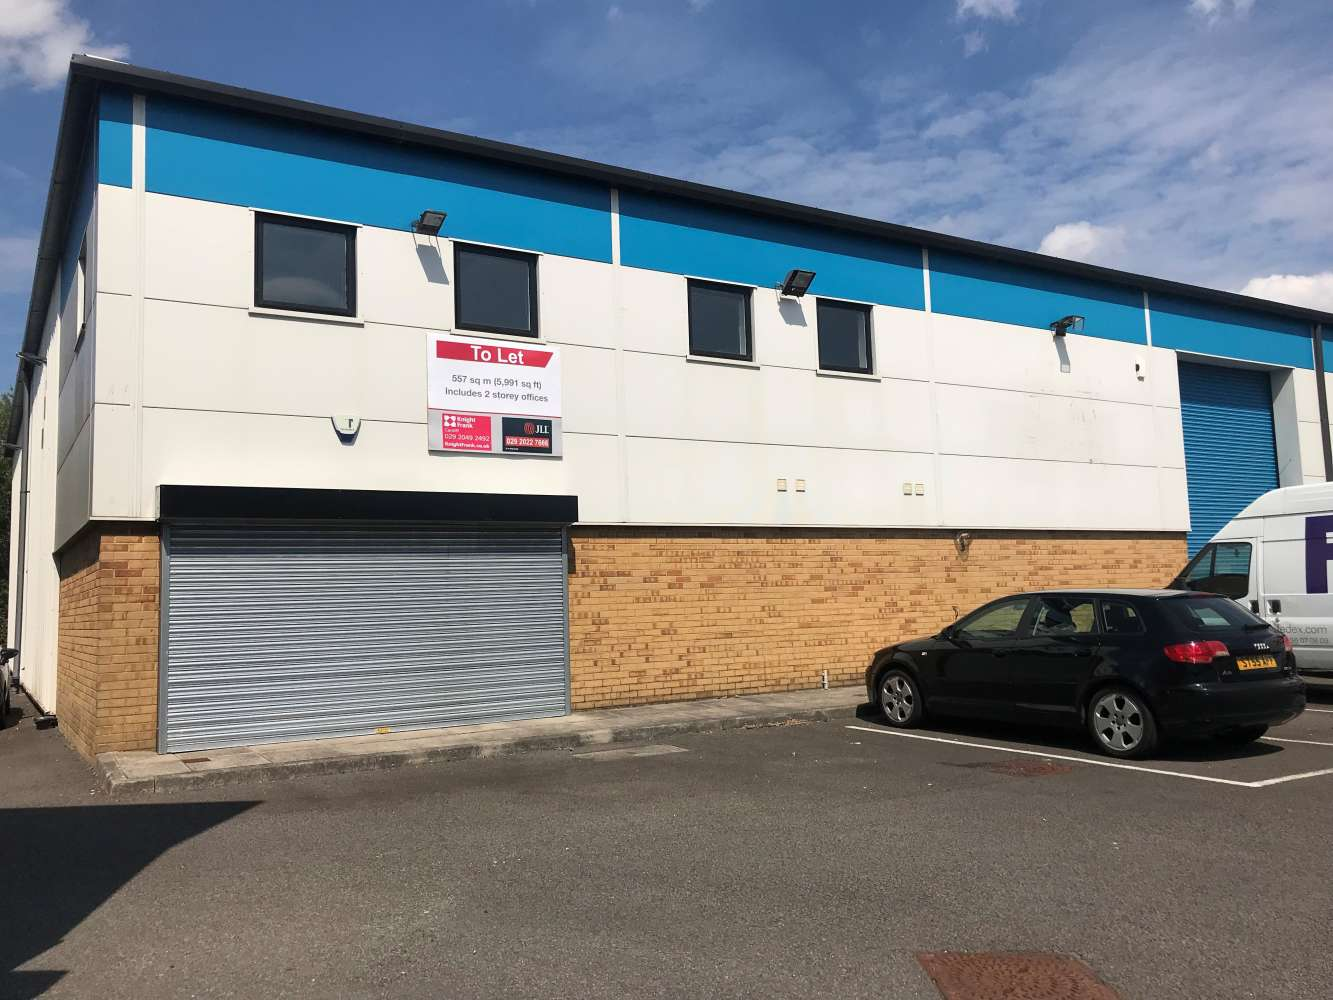 Rent, Unit M1, The Levels Business Park, Cardiff, CF3 2PX | JLL